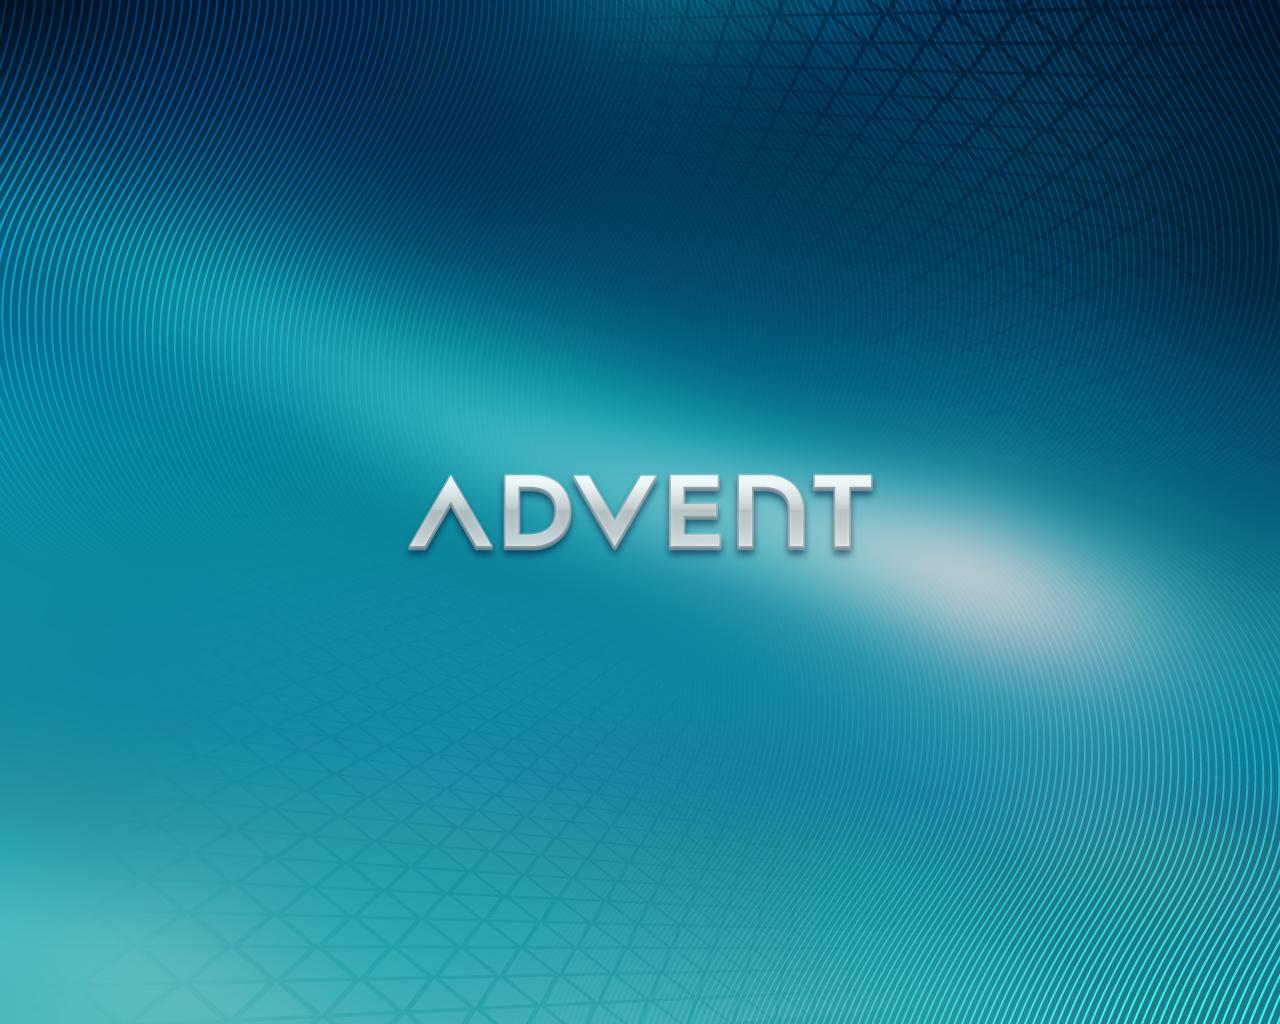 Advent Calendar Live Wallpaper : Catholic advent wallpaper wallpapersafari